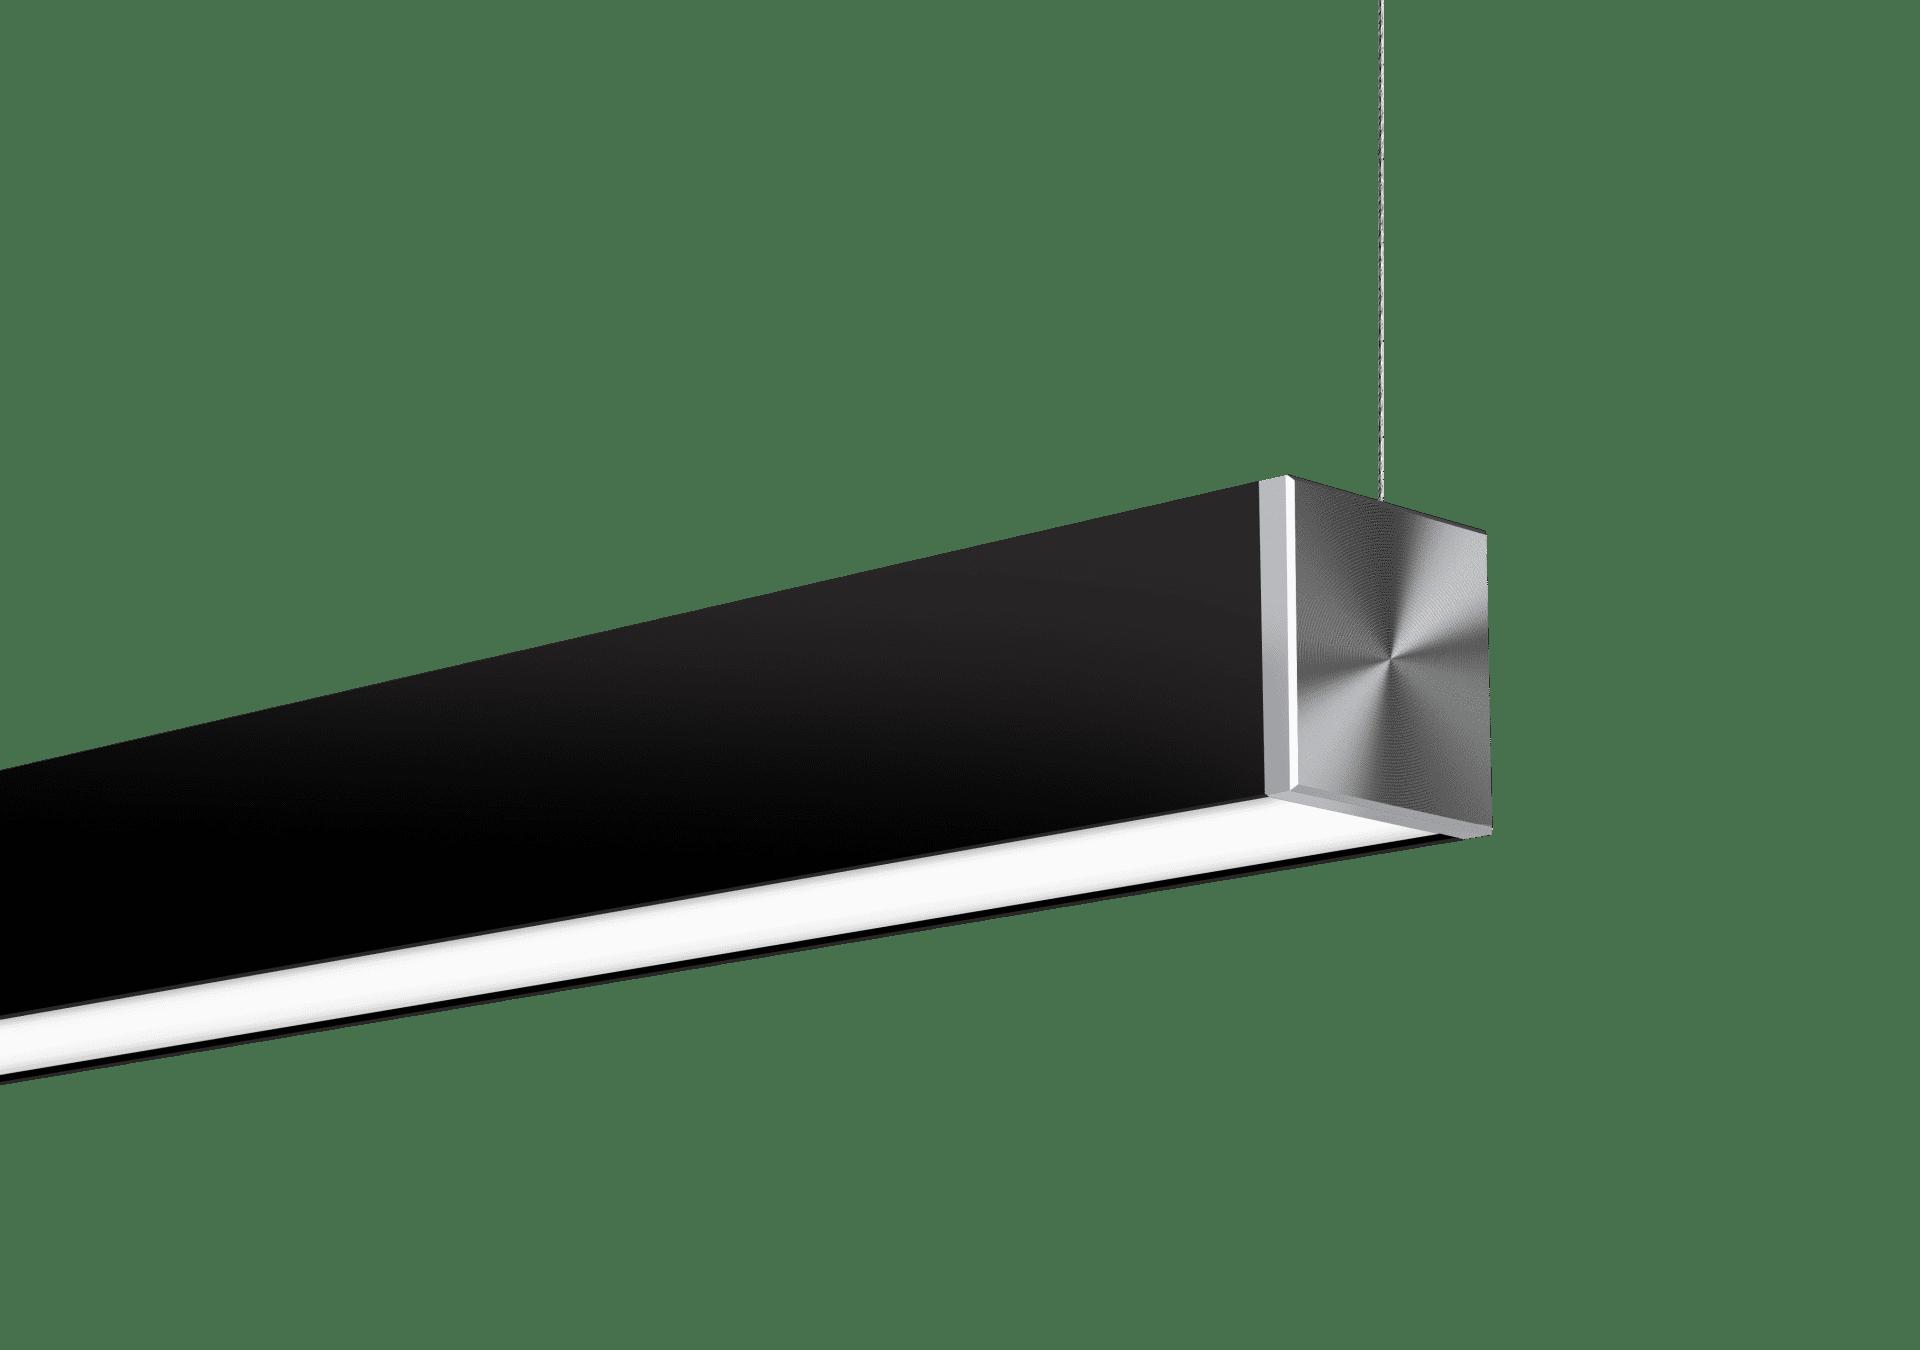 Nitrogen 3 Black Cable Suspended